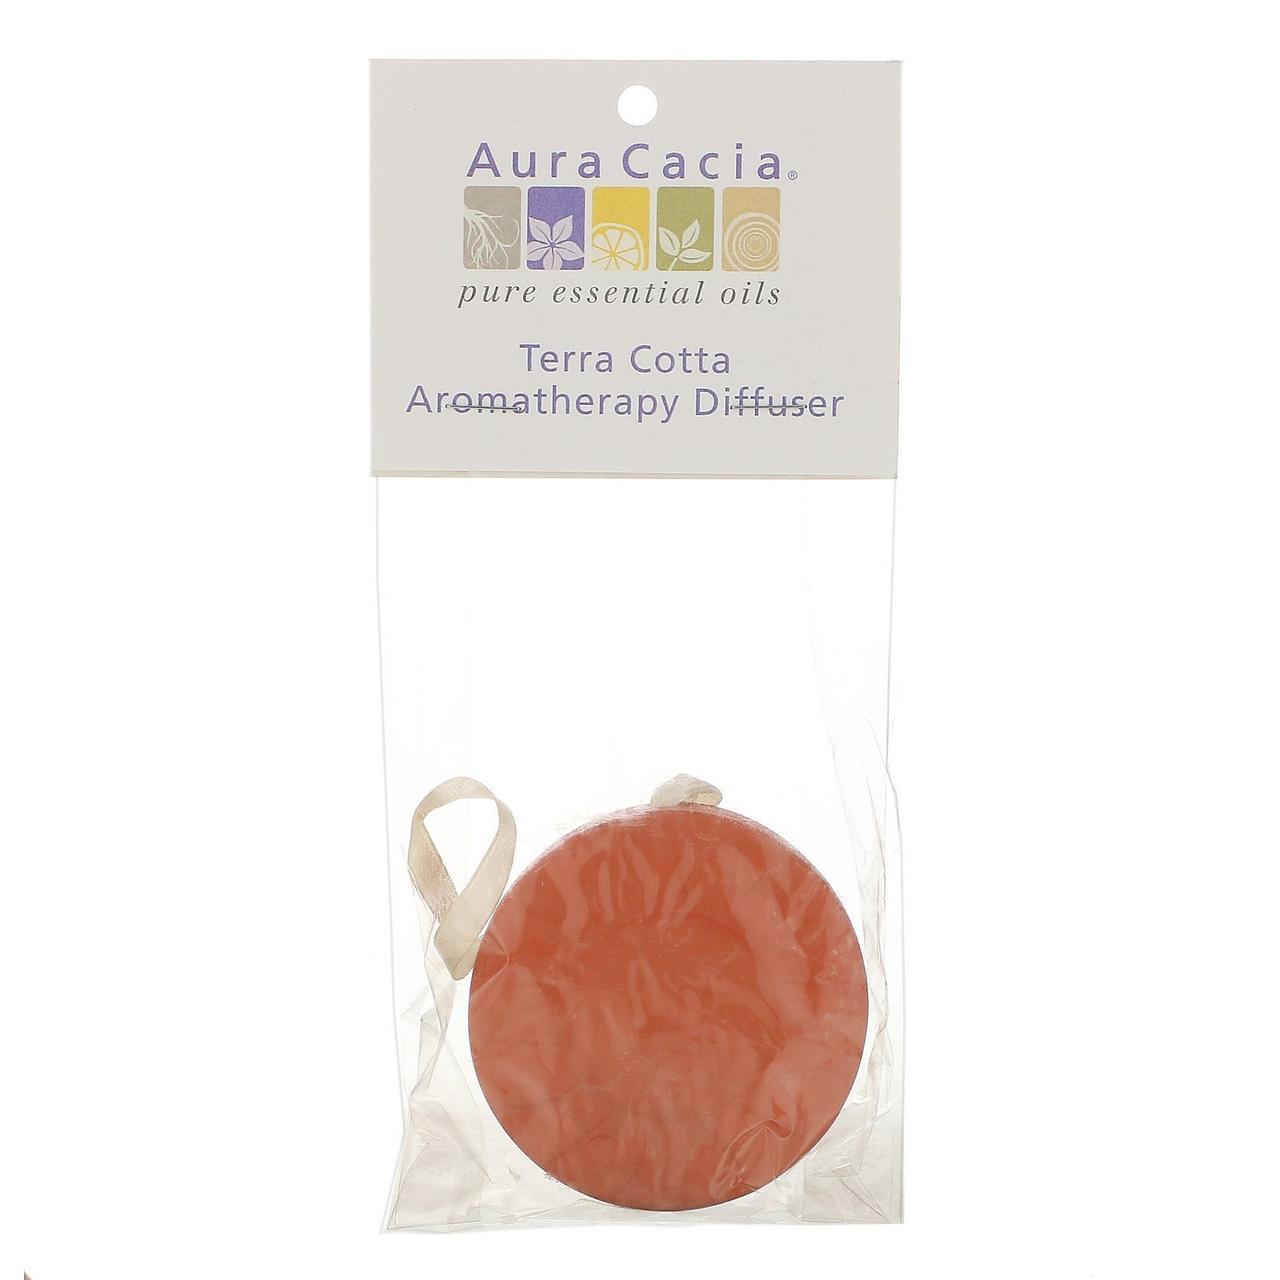 Ароматерапевтичний дифузор, сонце (Terra Cotta Aromatherapy Diffuser), Aura Cacia